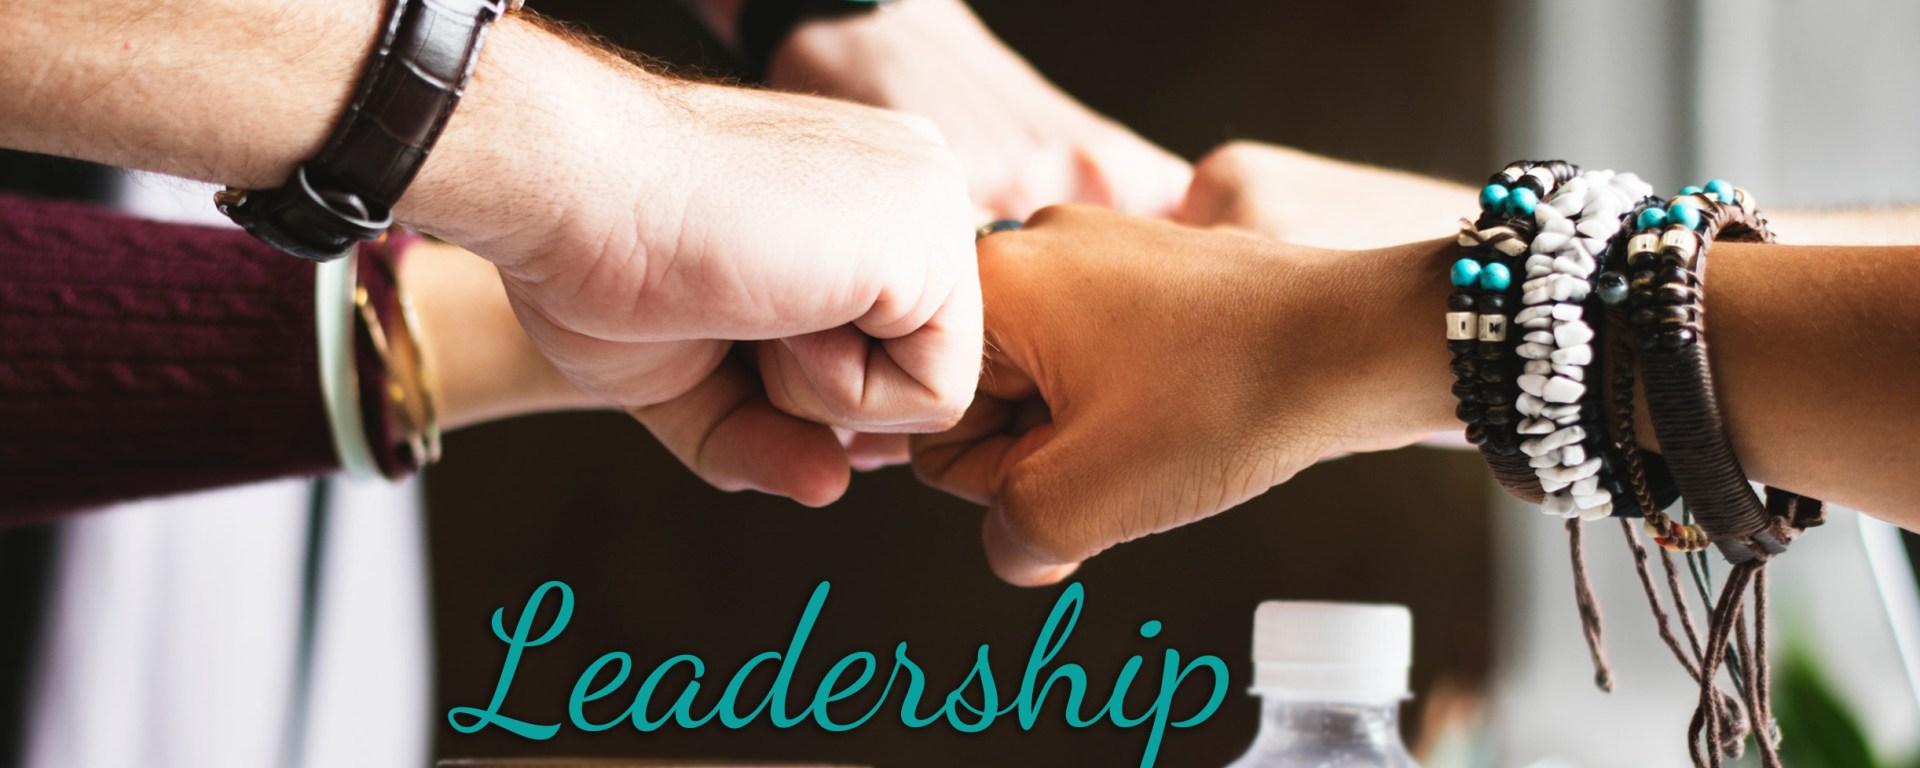 Leadership Fist Bump Oana Harrison Blog